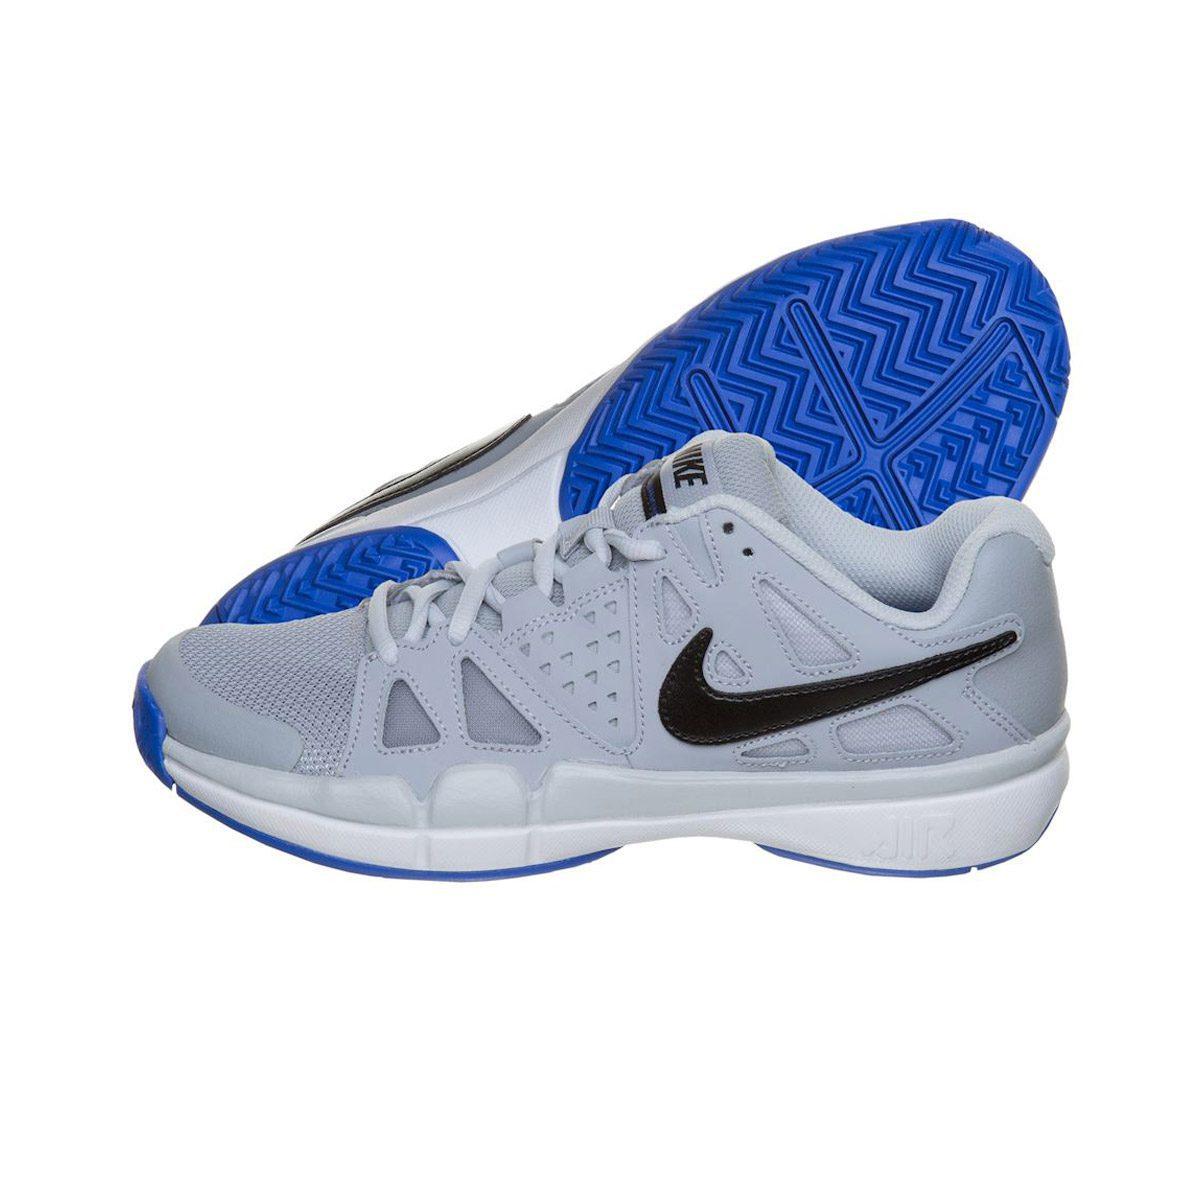 8ad2195ef3b Nike Air Vapor Advantage Women s Shoes - Blue Tint - Peake ...